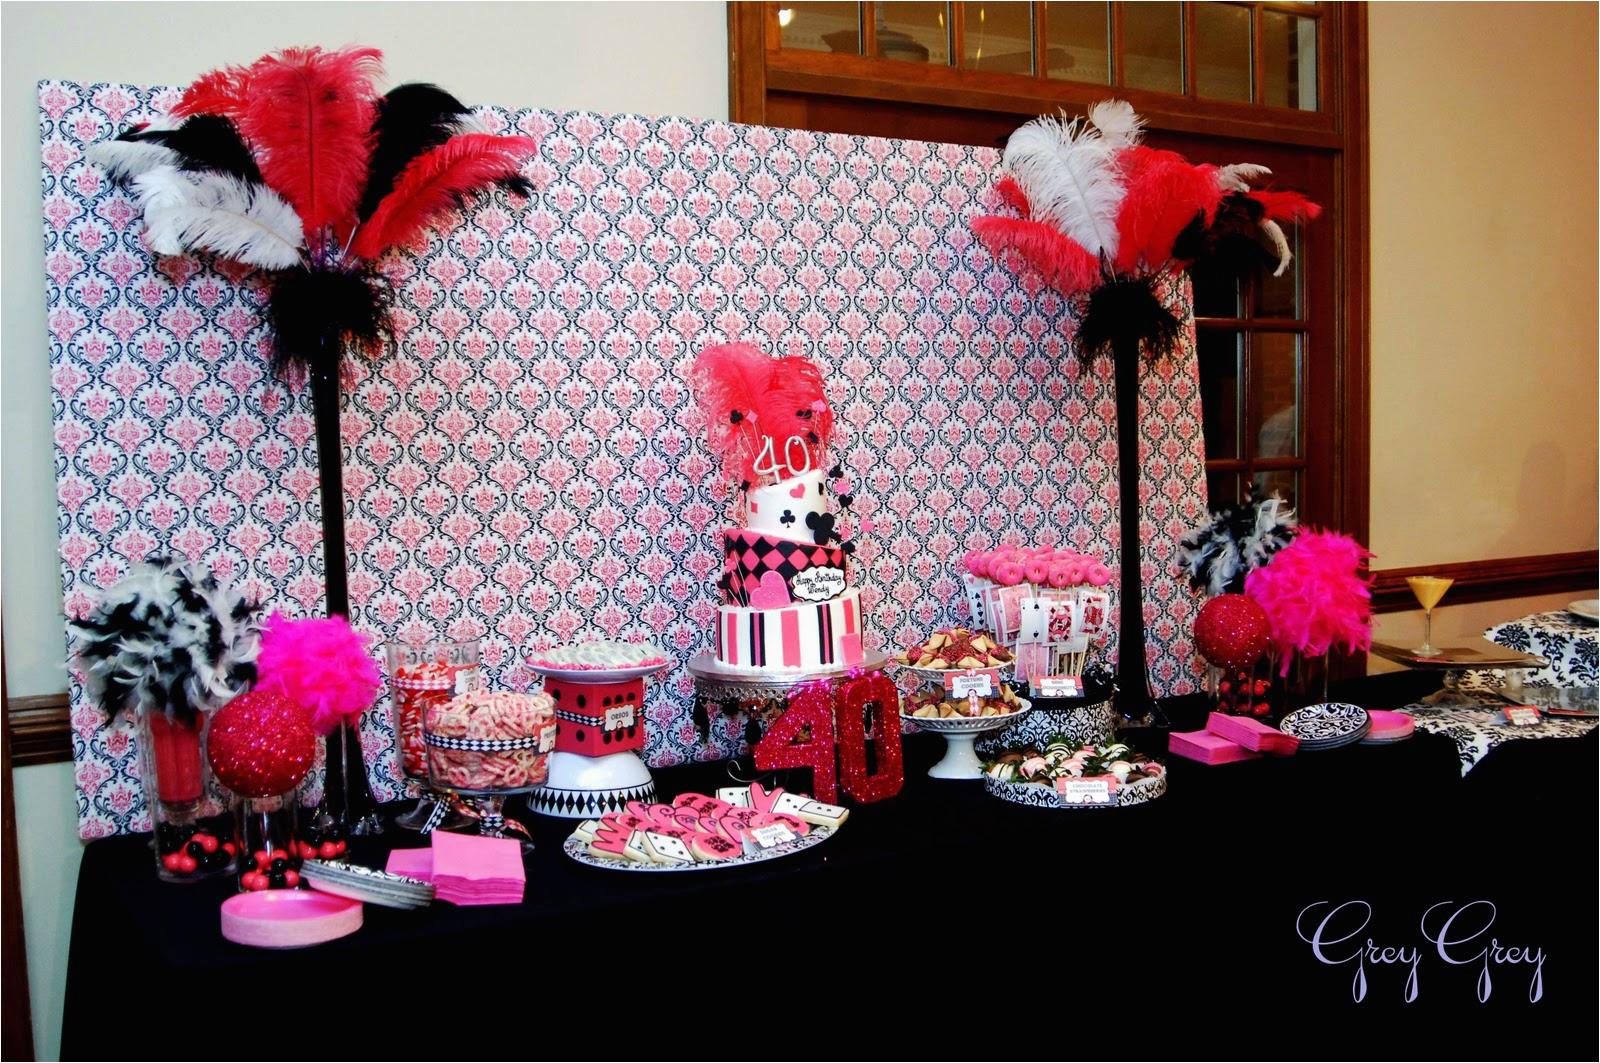 pink and black party decorations 1 desktop wallpaper